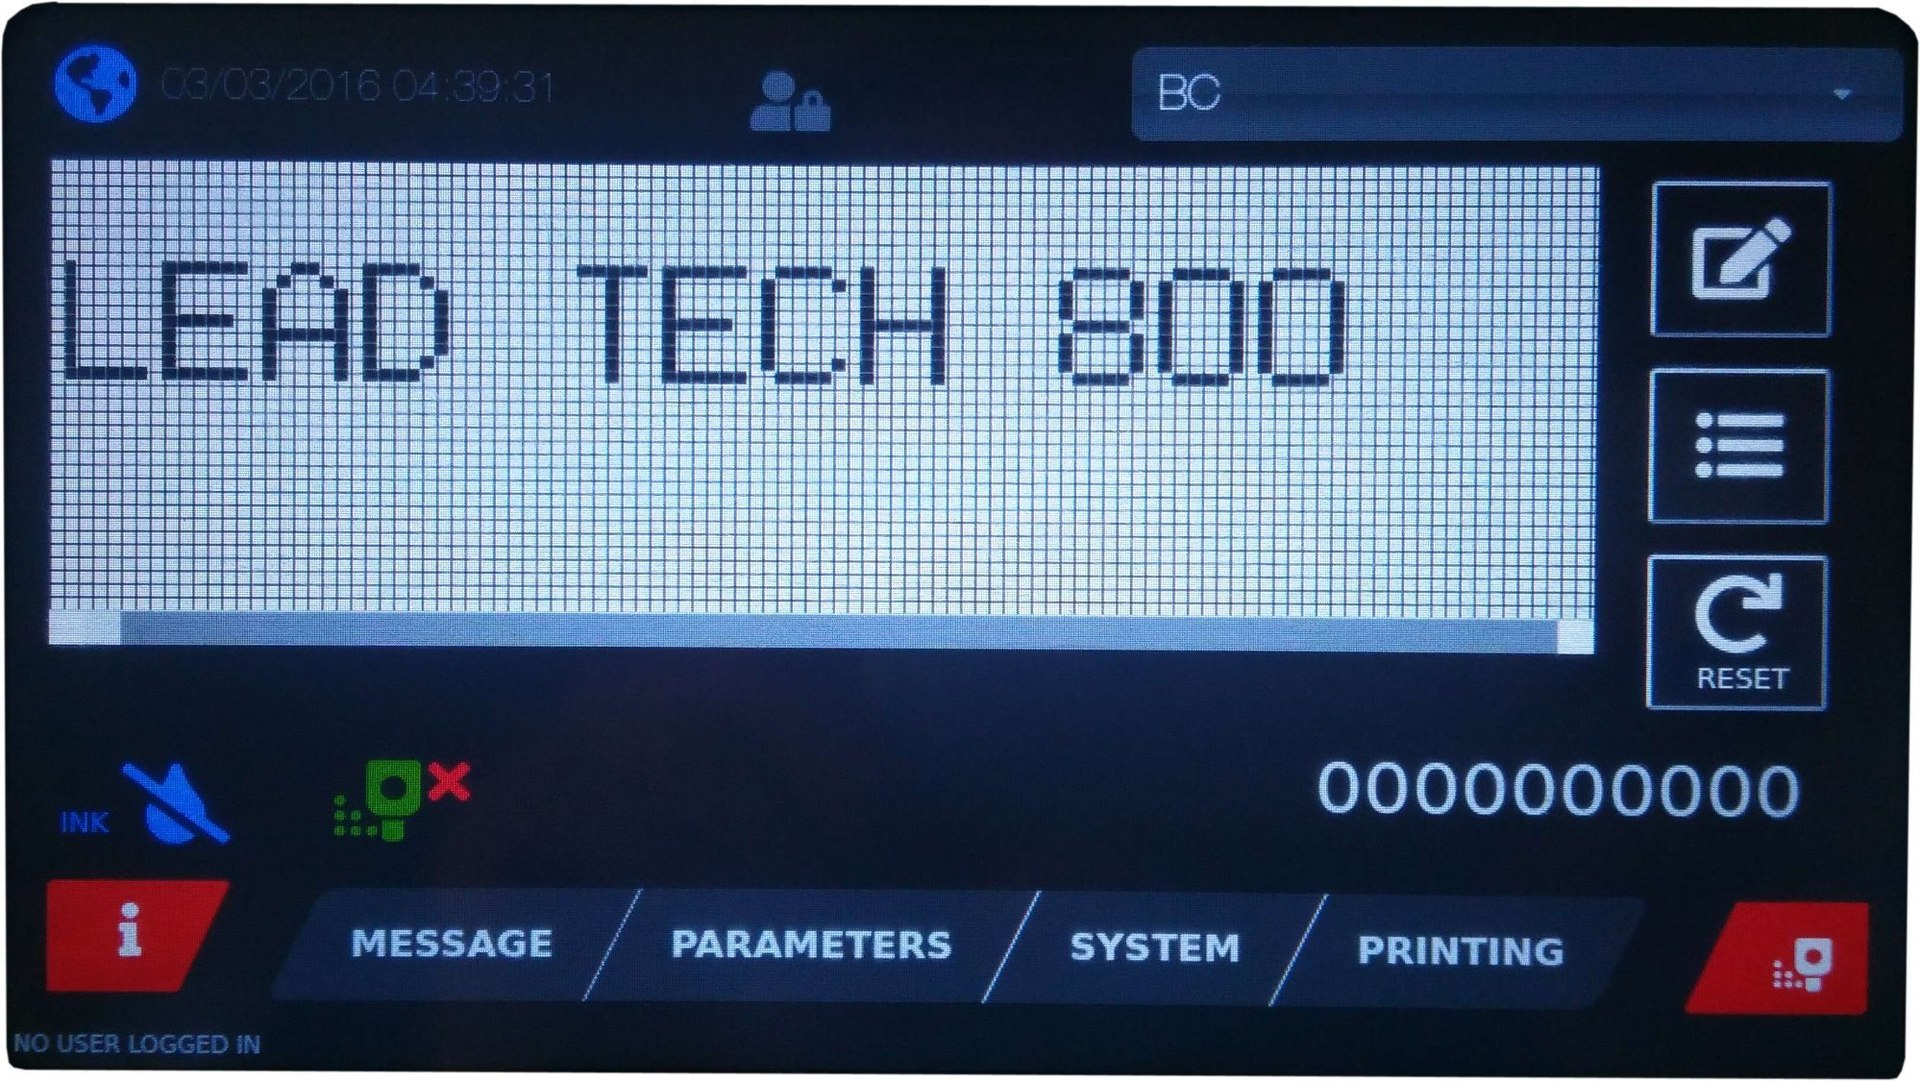 Lead Tech PVC Pipe Cij Inkjet Printer Lt800